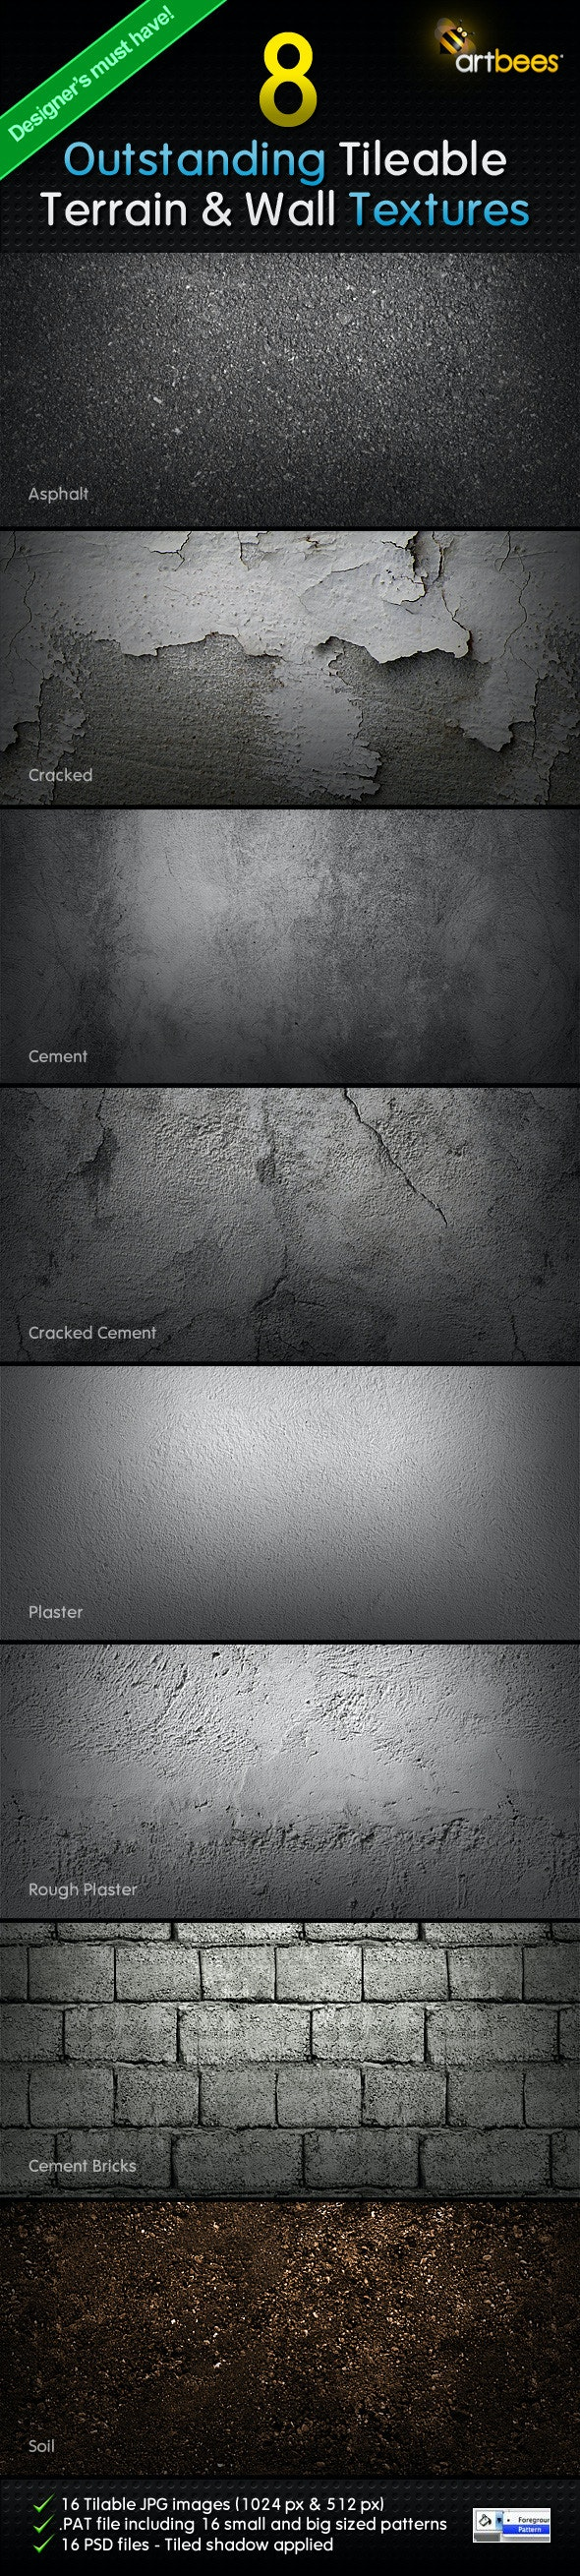 8 Tileable Terrain & Wall Textures - Textures / Fills / Patterns Photoshop